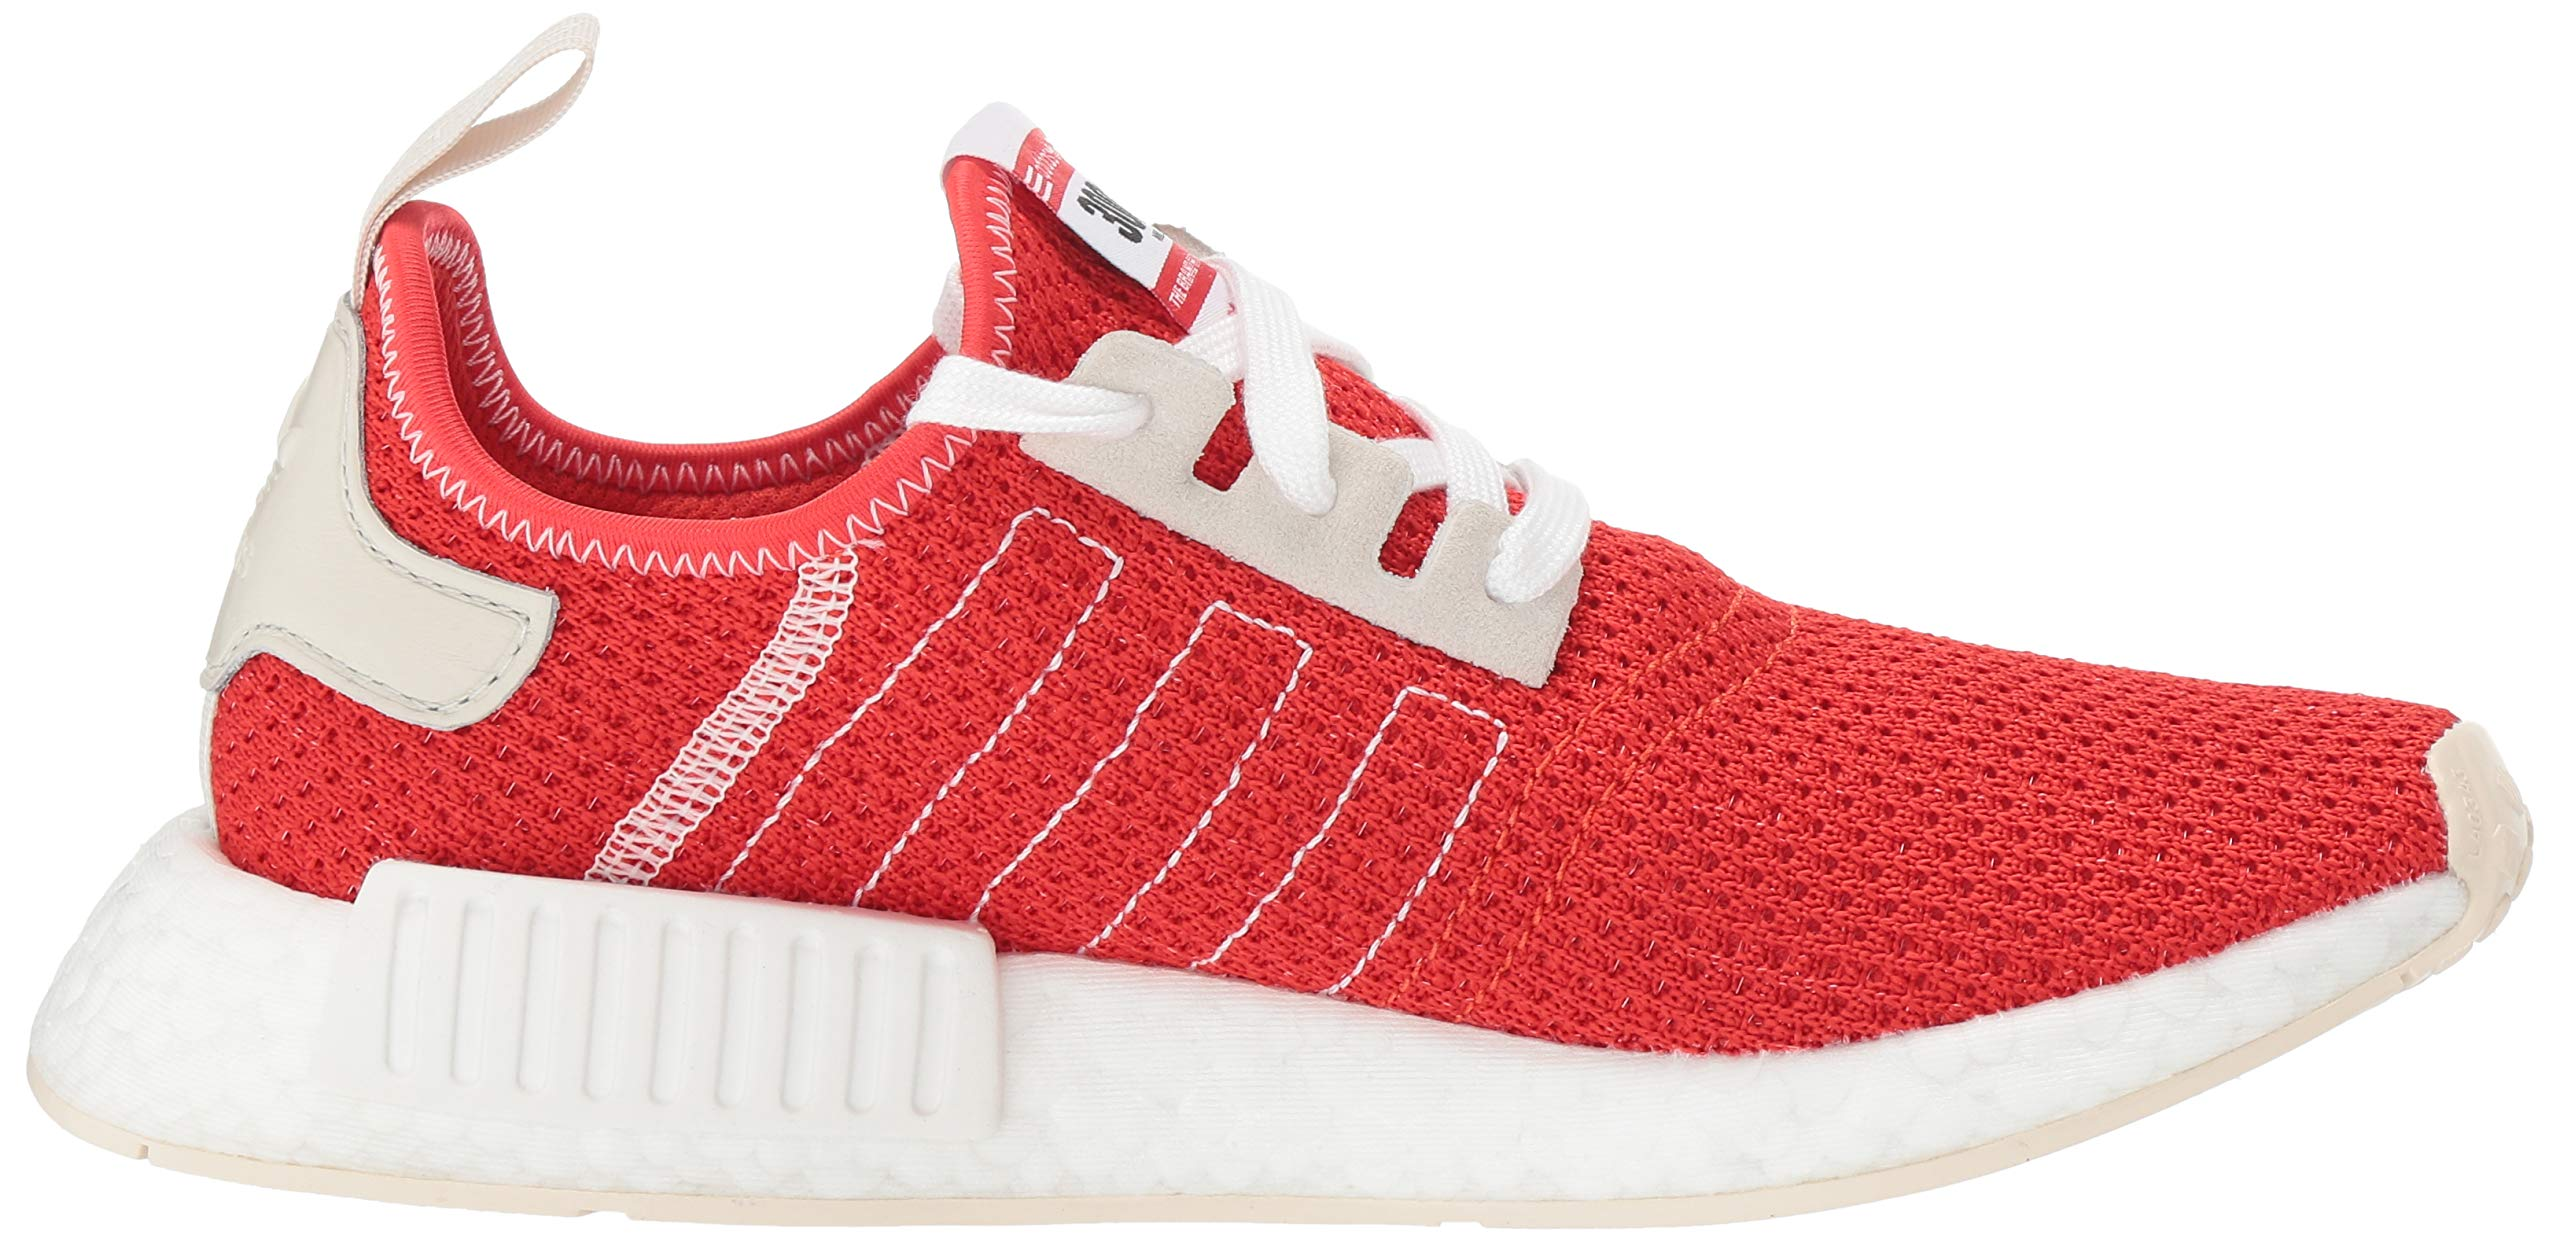 adidas Originals Men's NMD_R1 Running Shoe, Active red/Ecru Tint, 4 M US by adidas Originals (Image #7)